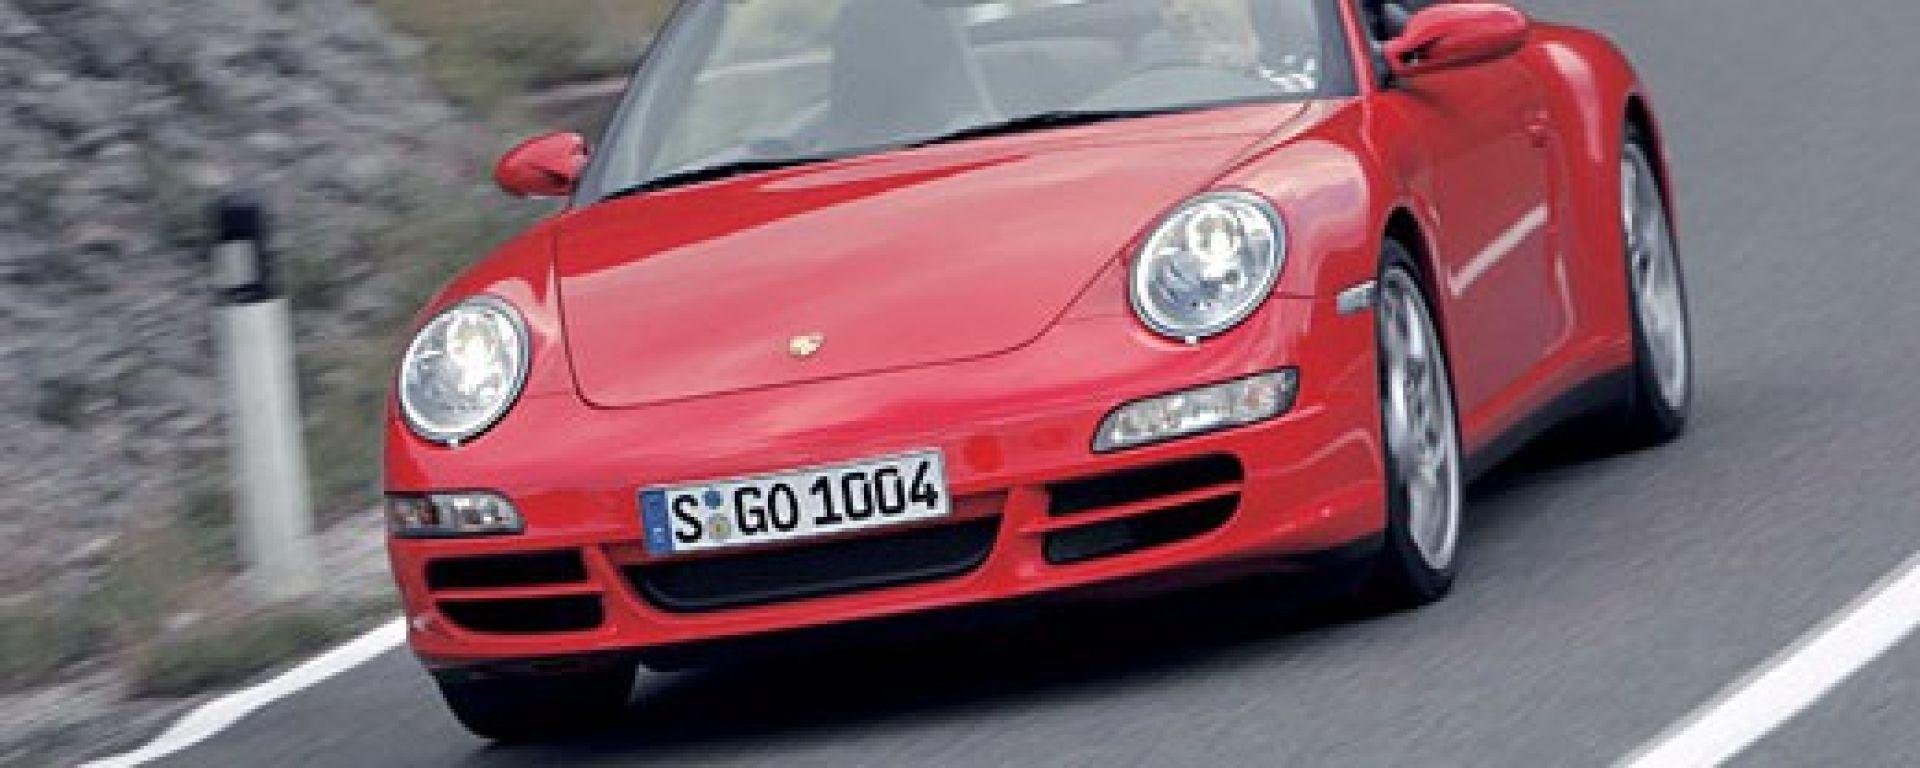 Porsche 911 Carrera 4 e 4S Cabriolet